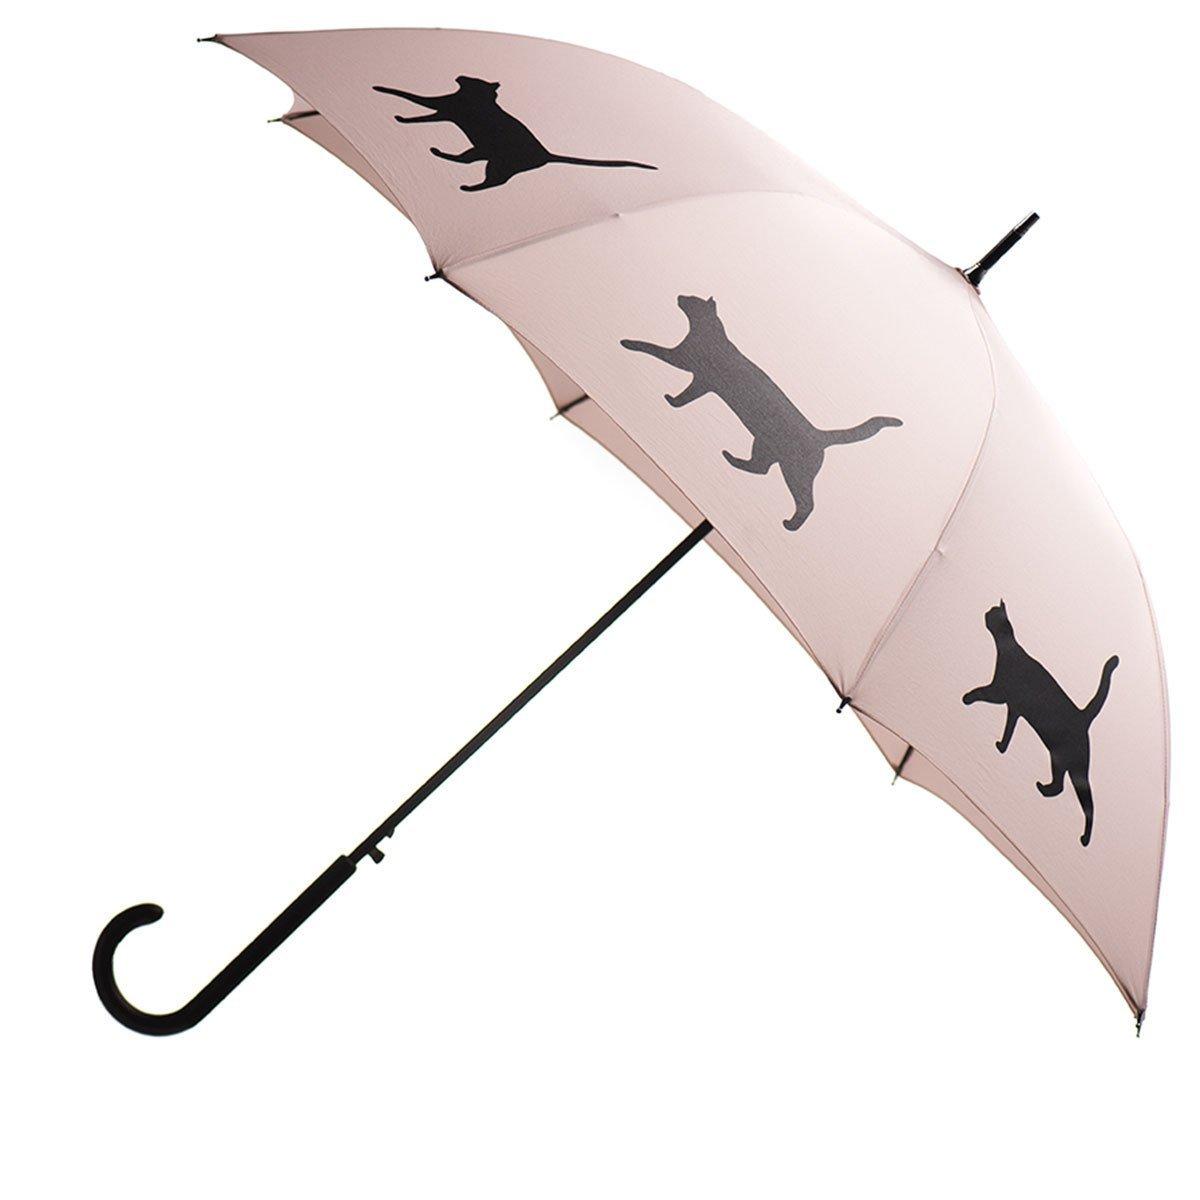 The San Francisco Umbrella Company Unisex-Adult (Luggage only) auto Open Stick Umbrella, Warm Taupe/Black by The San Francisco Umbrella Company